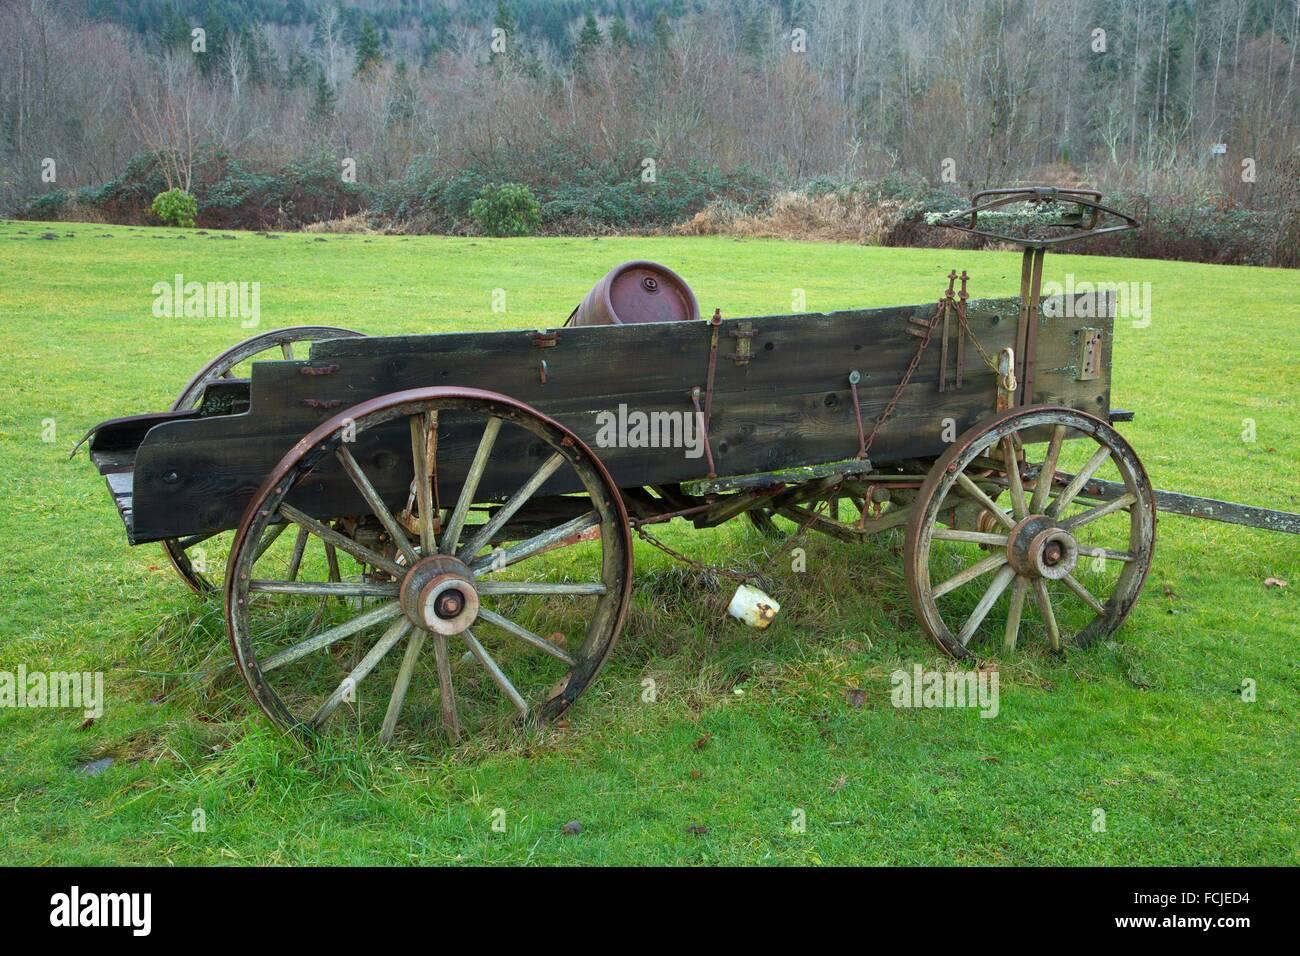 Wagon, Millpond Park, Eatonville, Washington. - Stock Image